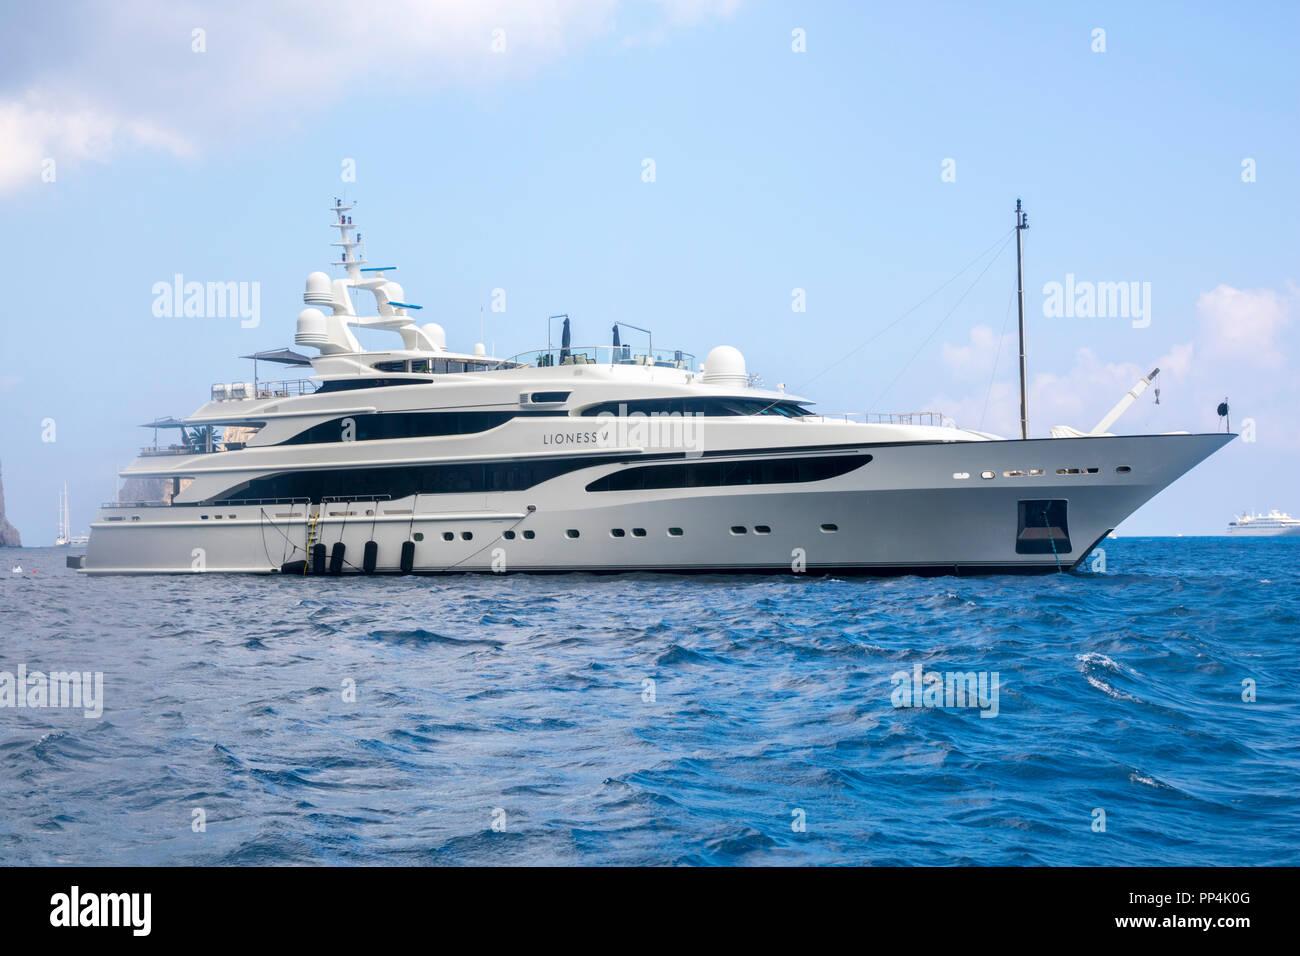 Luxury yacht cruising Amalfi Coast, Isle of Capri, Gulf of Naples, Italy Europe travel concept, tourism boats, boat trip, wealthy concept best life - Stock Image